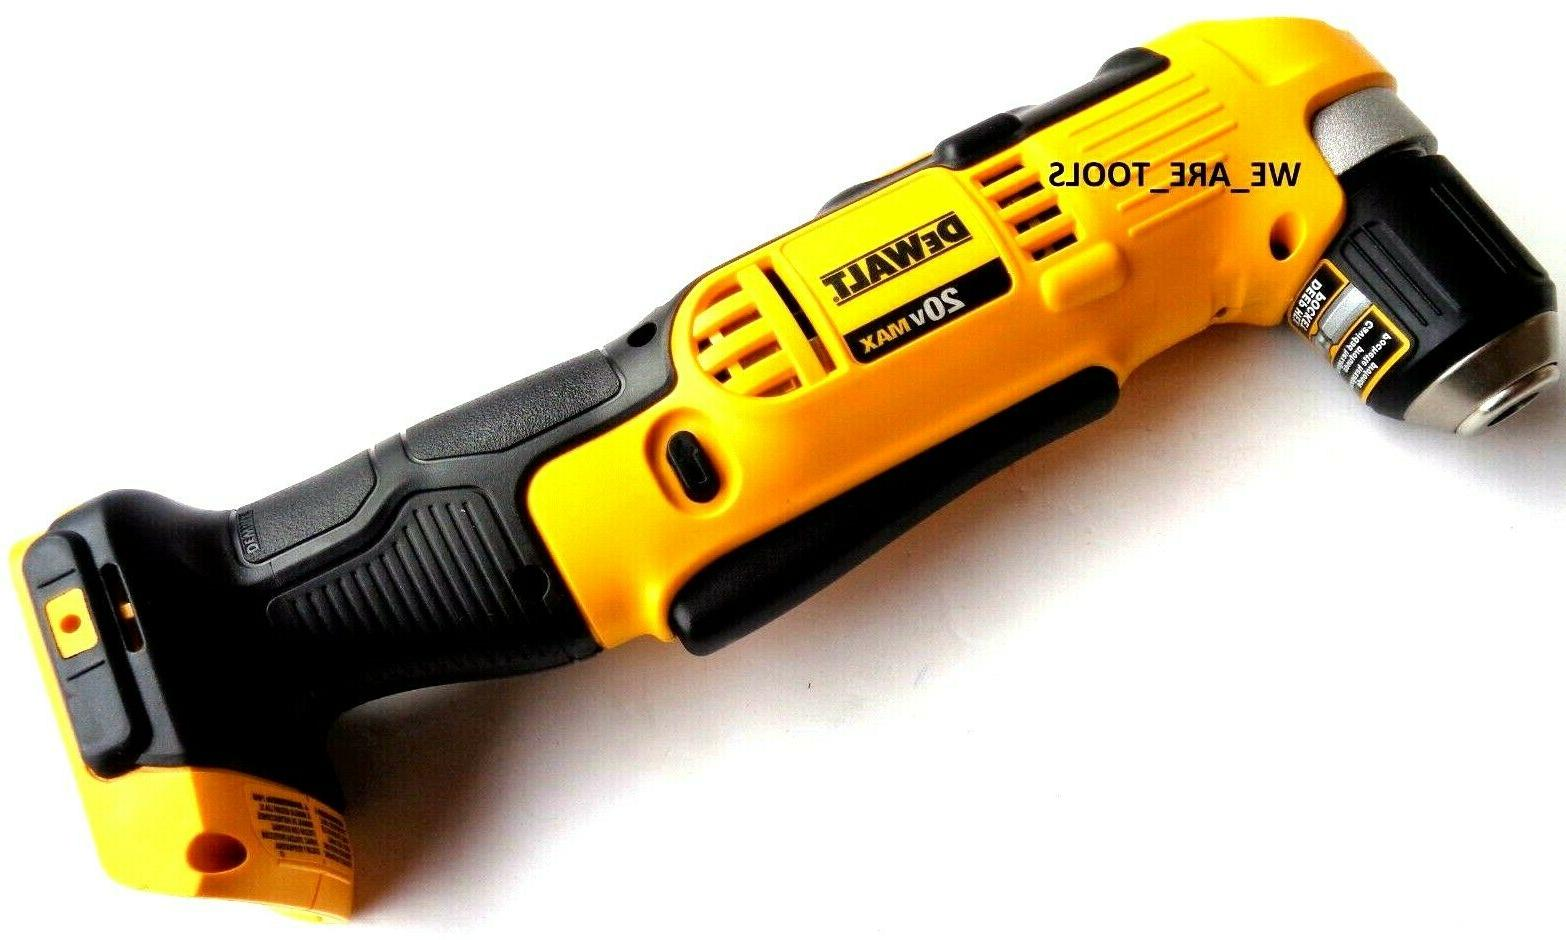 Dewalt DCD740 20V 3/8 Cordless Right Angle Drill,2) DCB200 3